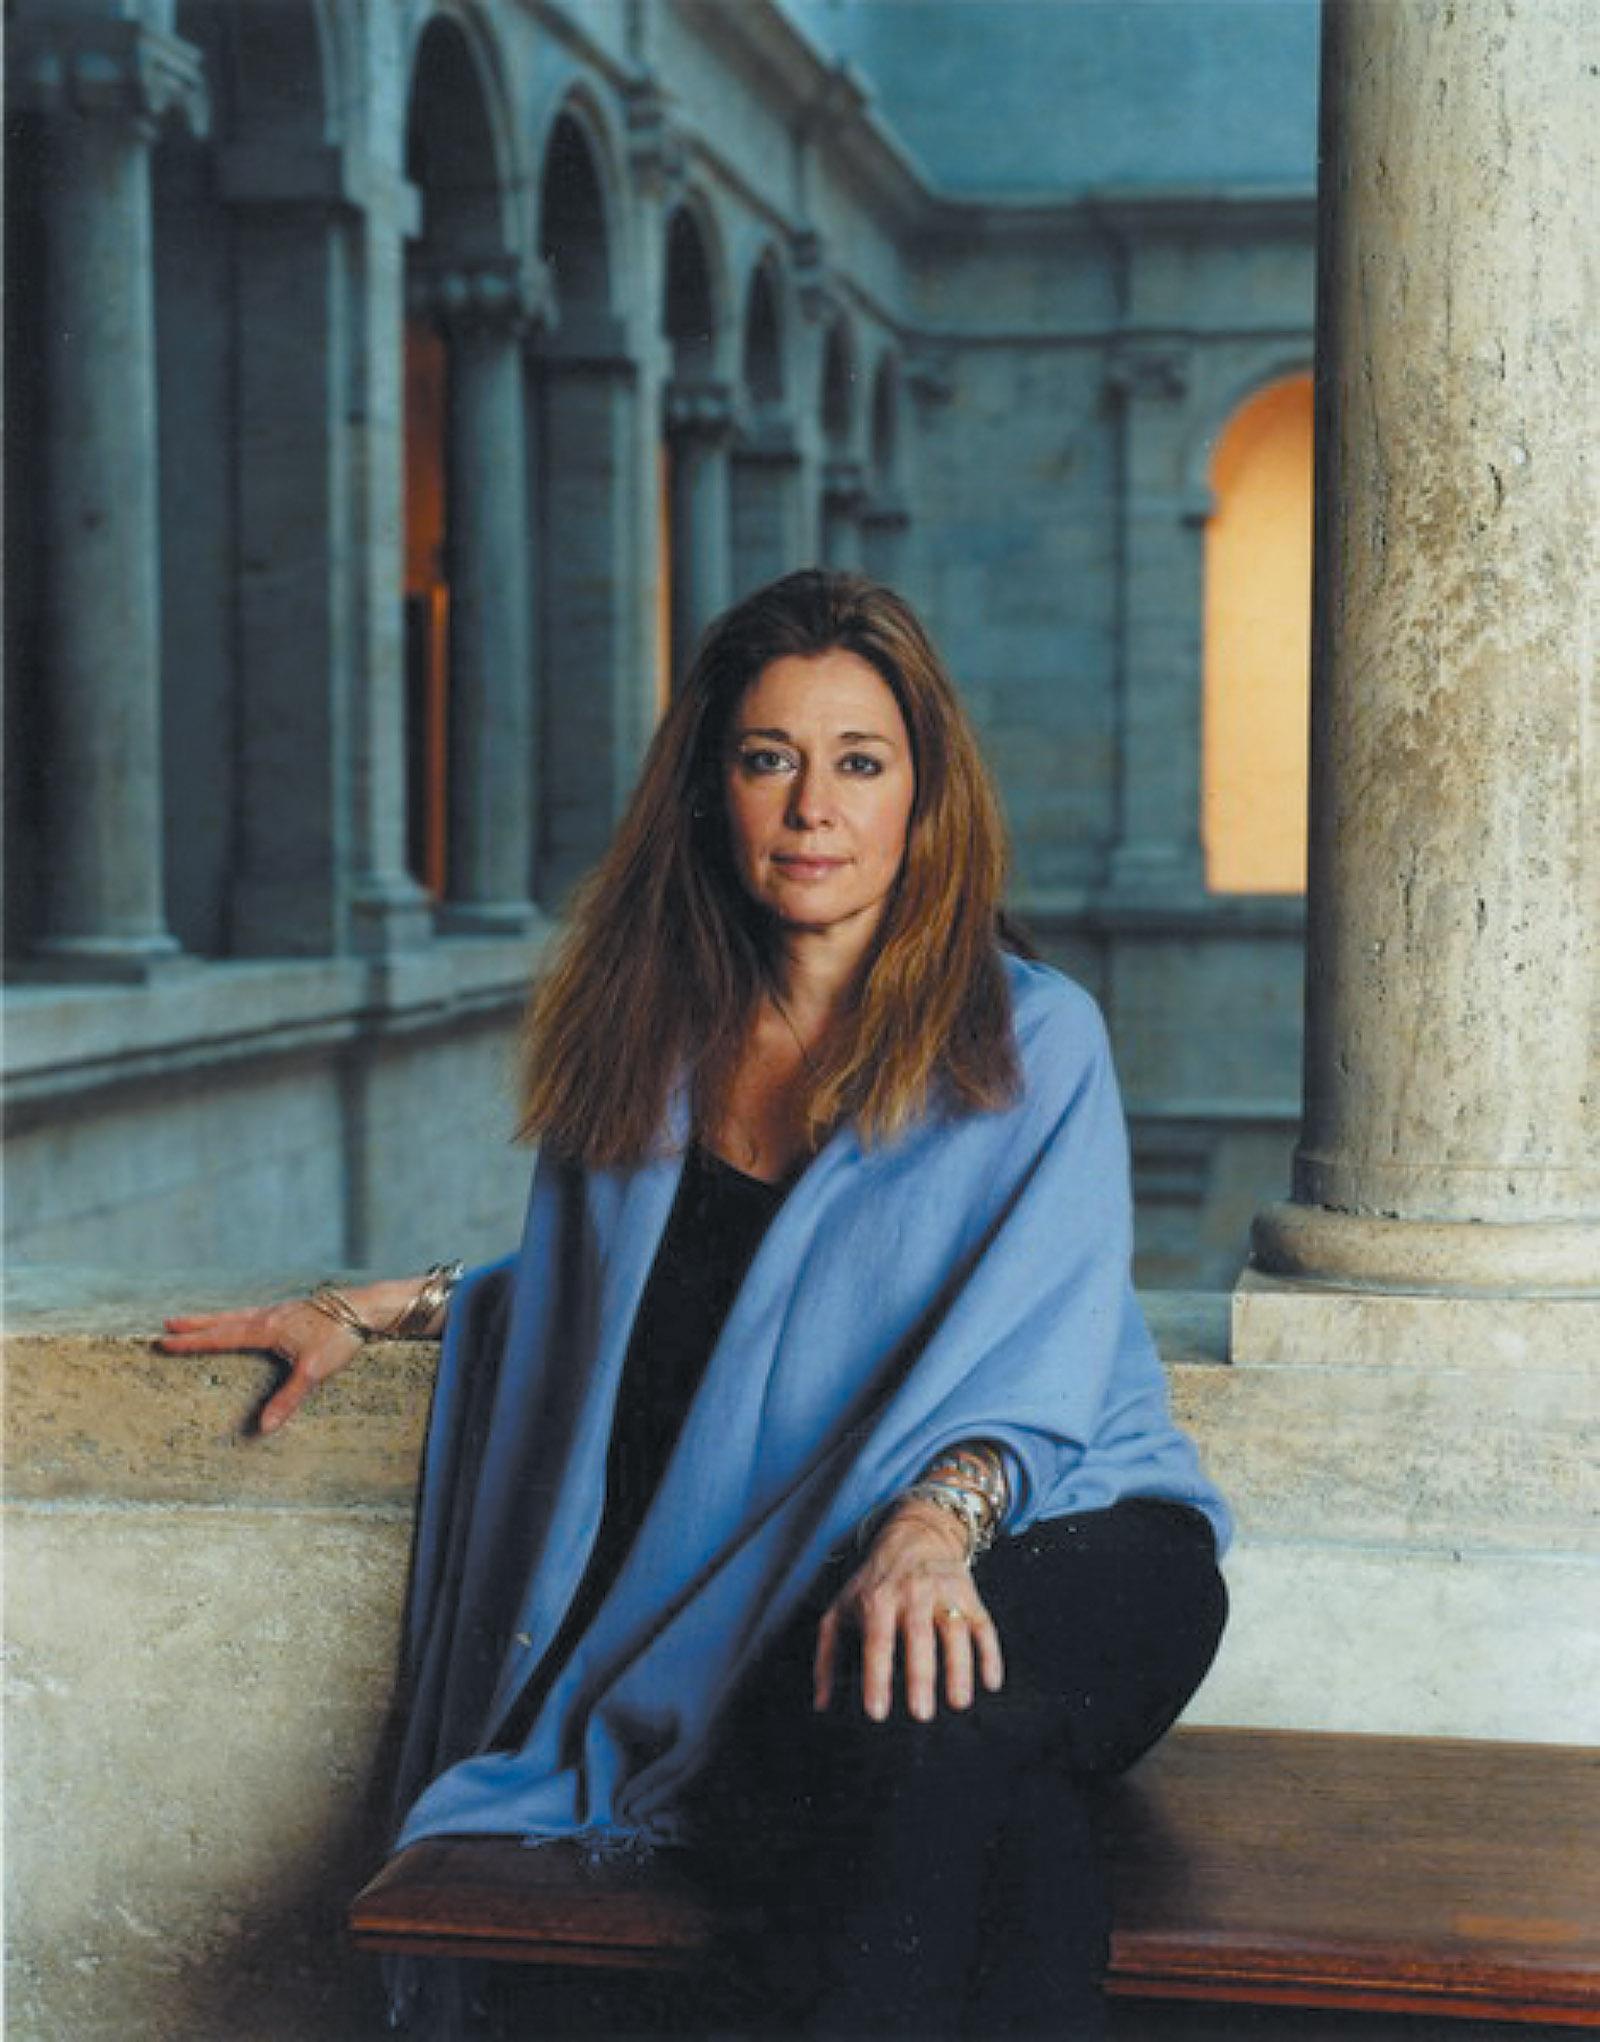 Jorie Graham at Harvard's Fogg Museum, Cambridge, Massachusetts, 2003